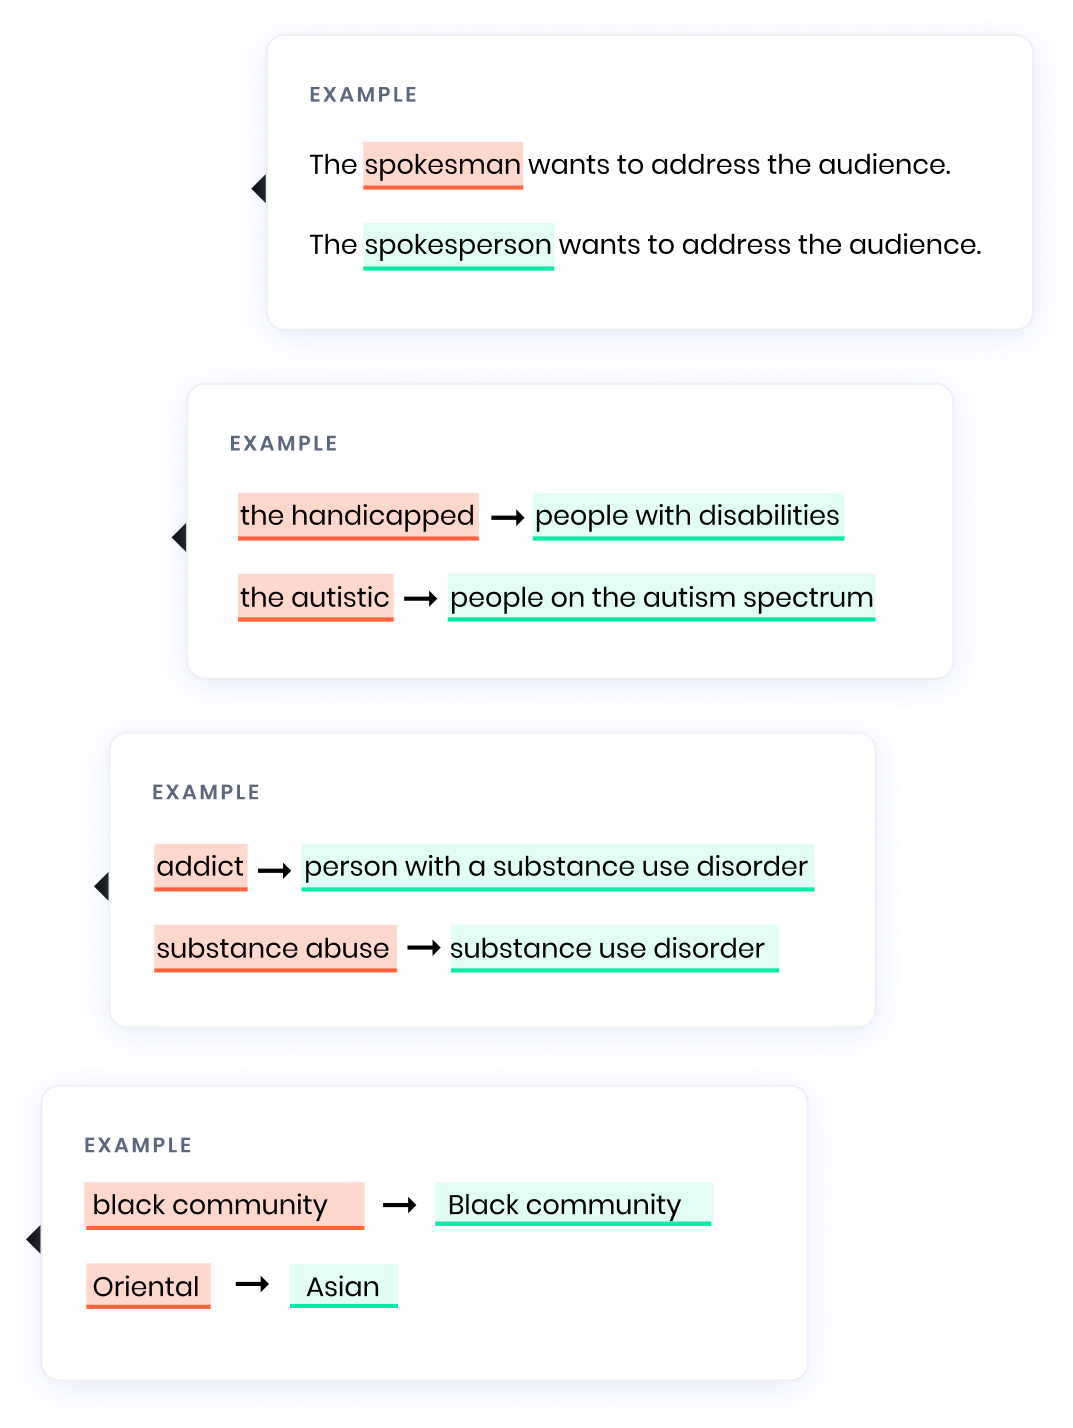 Natural-language-processer-2